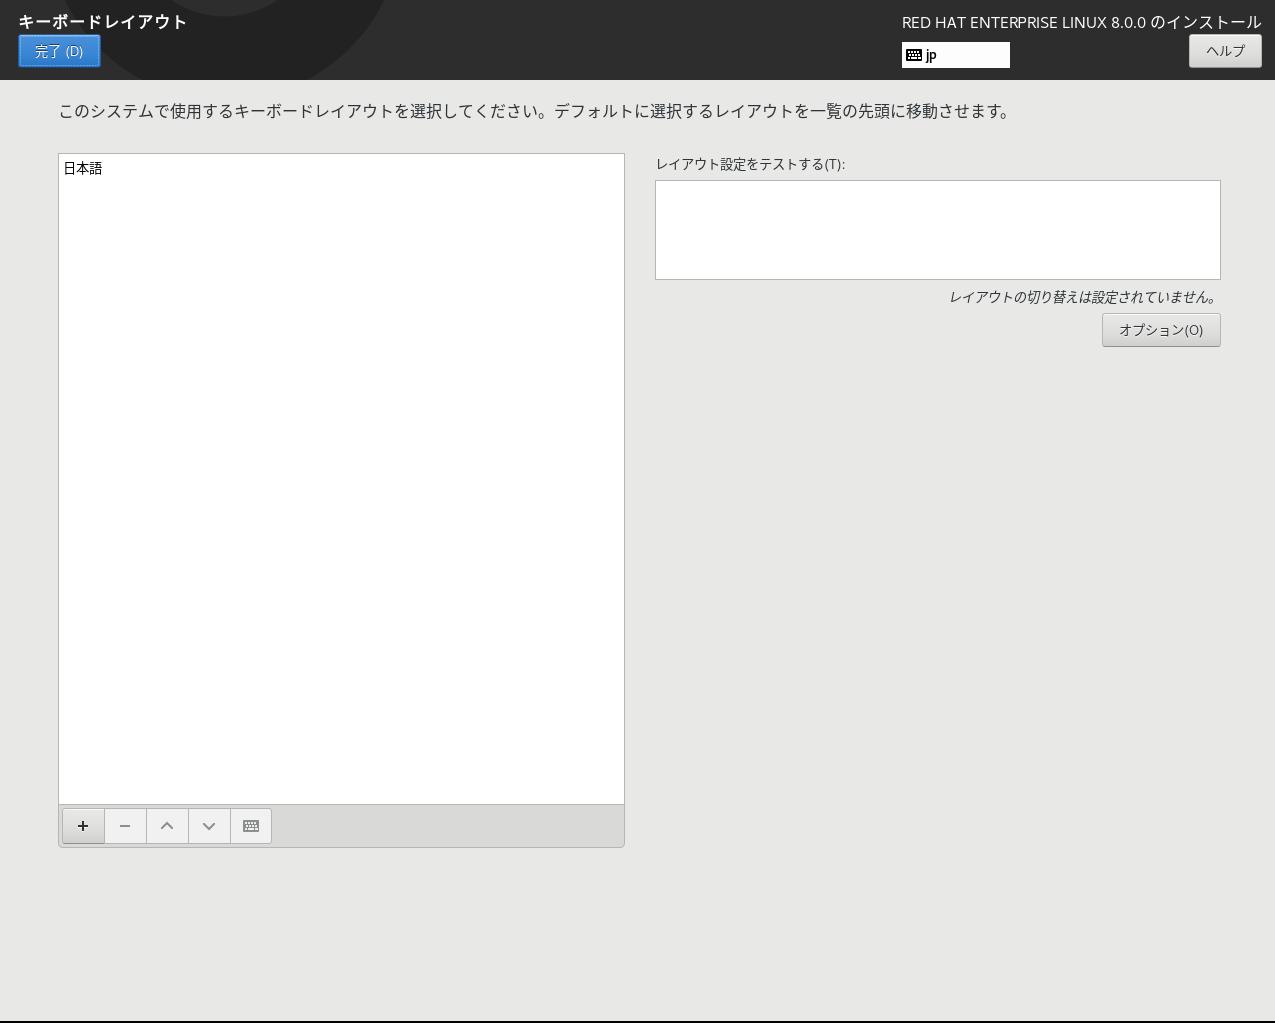 rhel8_install-02